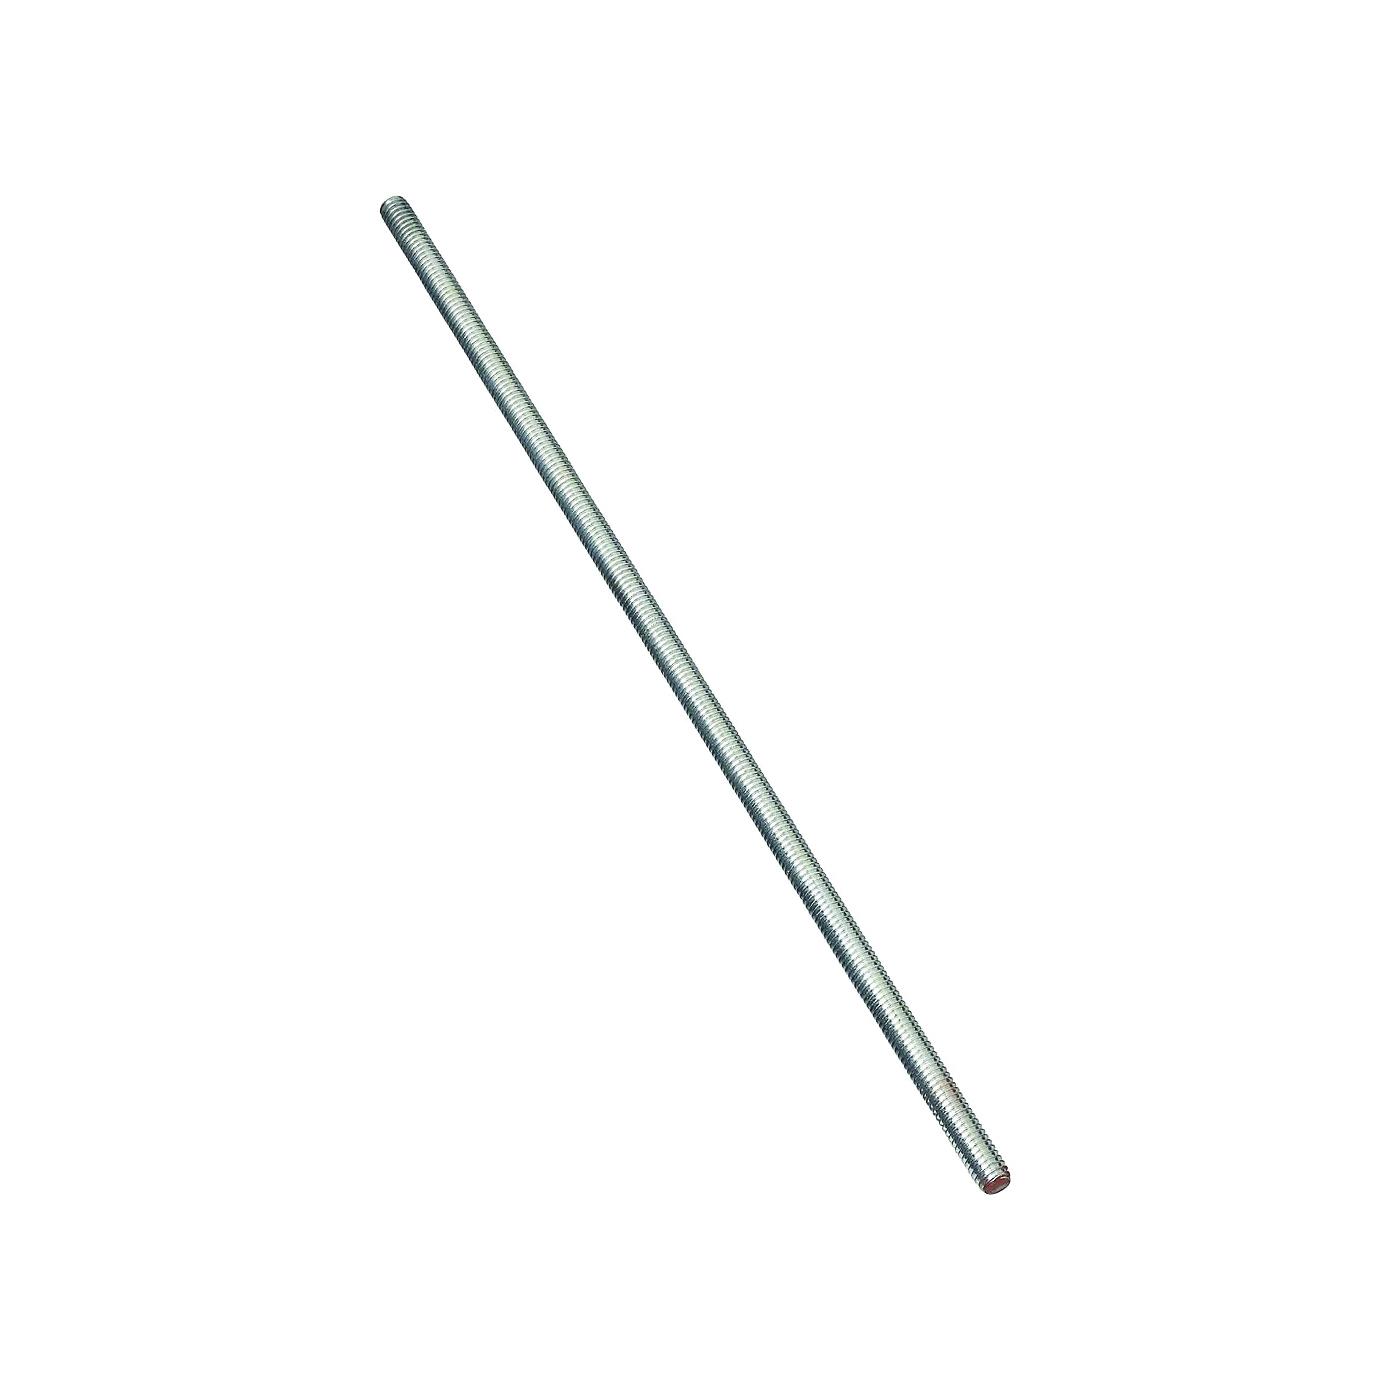 Picture of Stanley Hardware 179598 Threaded Rod, 5/16-18 Thread, 72 in L, A Grade, Steel, Zinc, UNC Thread